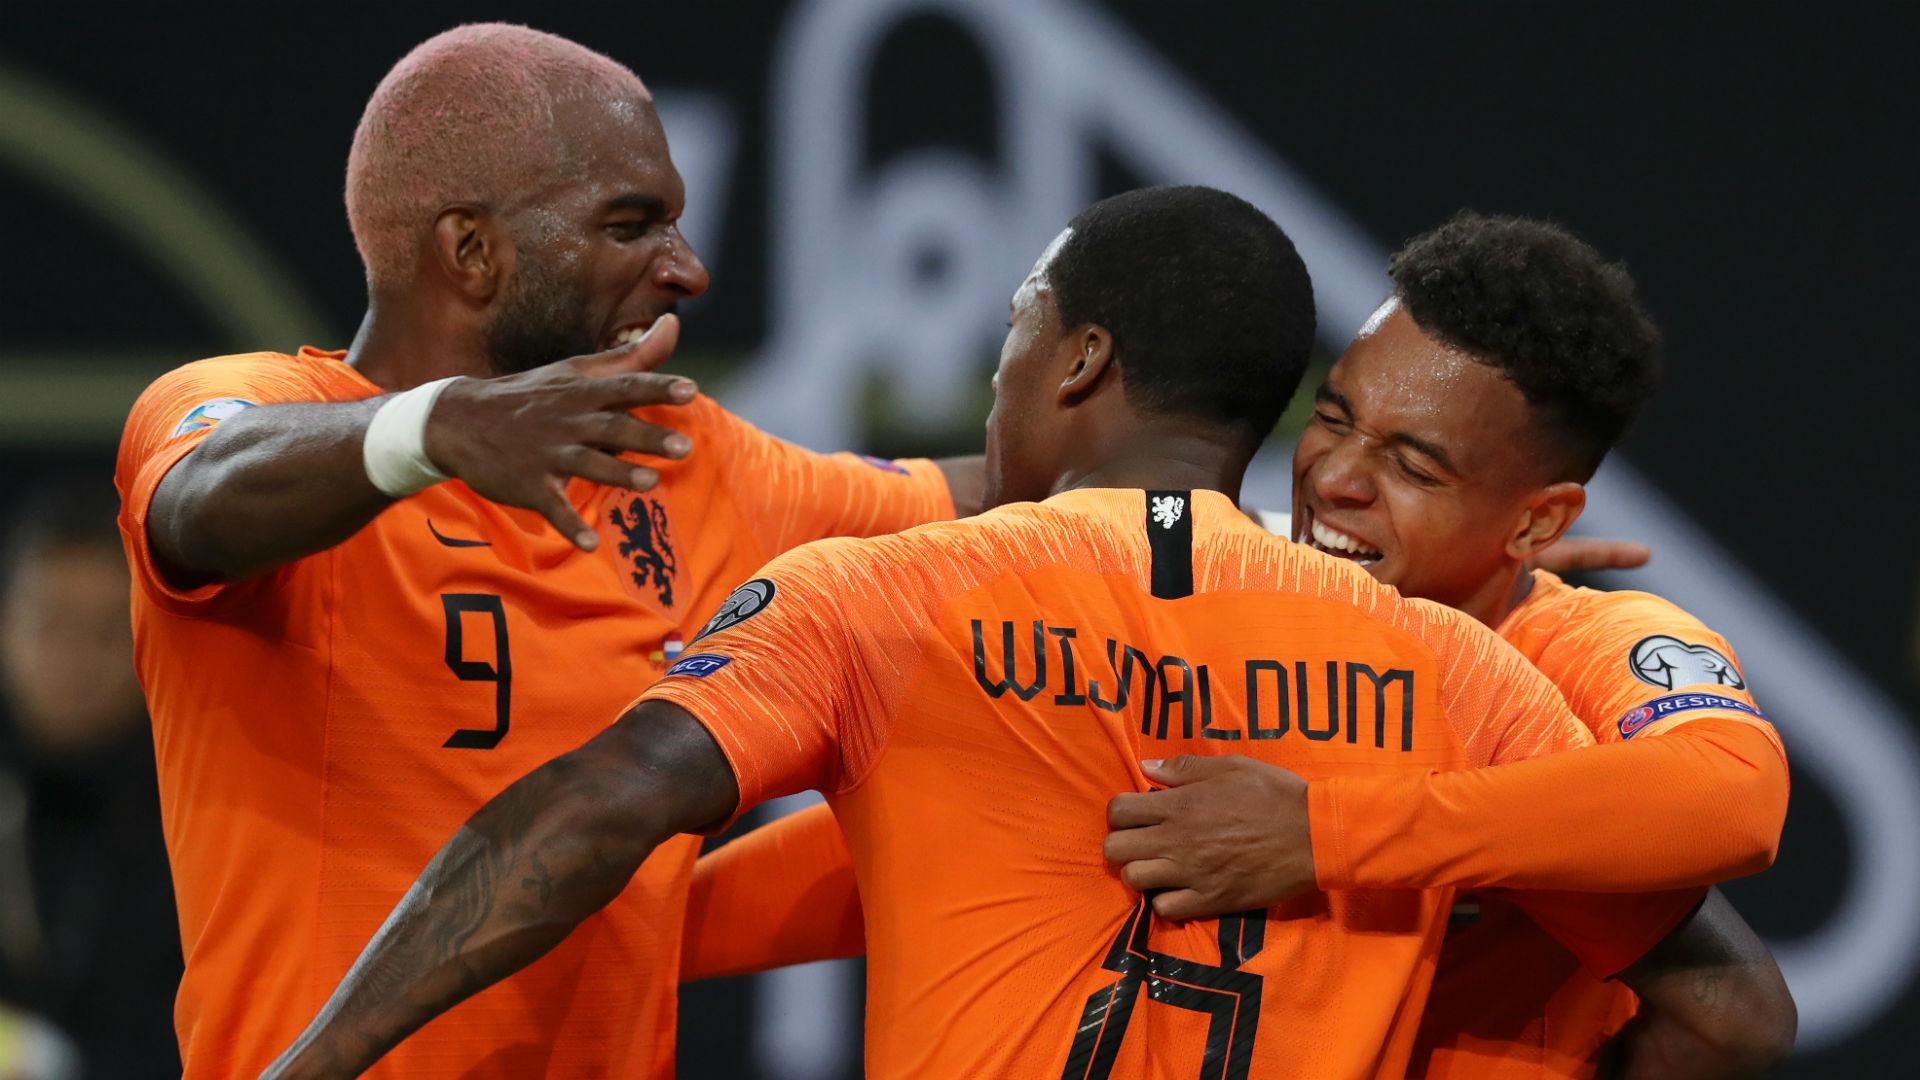 Estonia 0-4 Netherlands: Babel brace helps Oranje keep pressure on top two